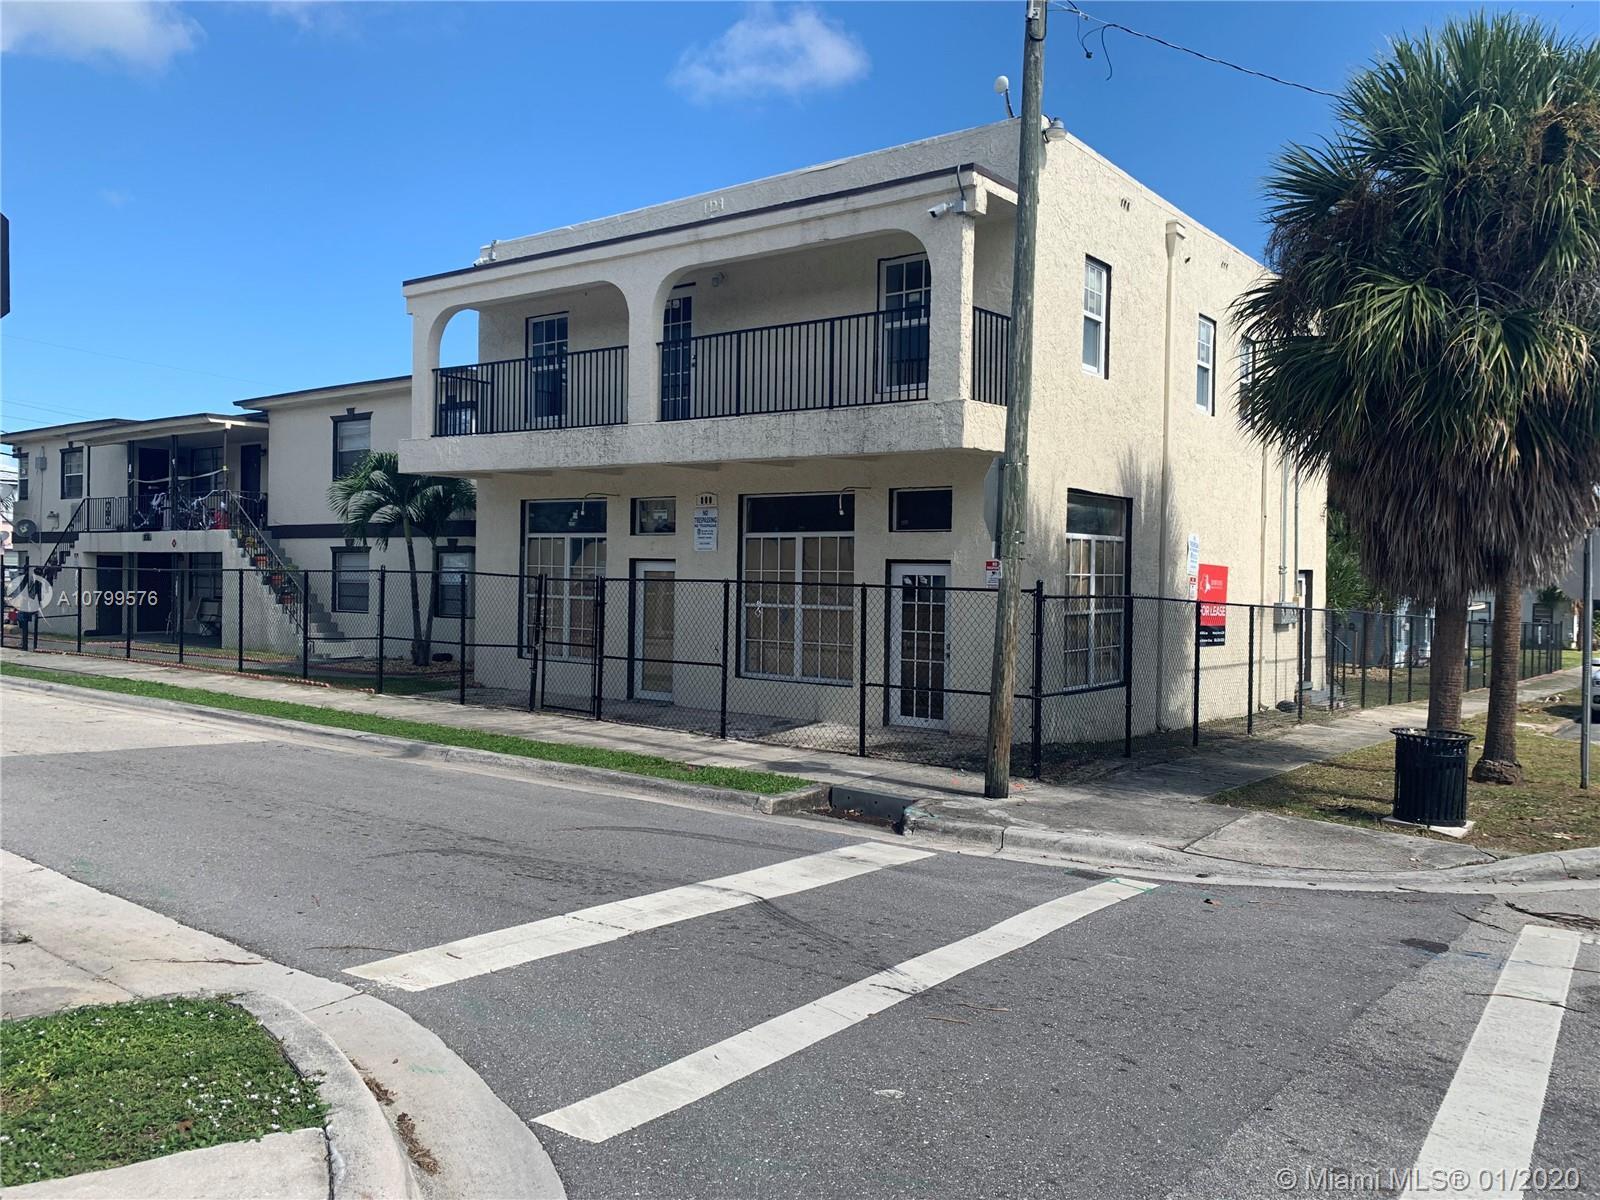 800 N Sapodilla Ave, West Palm Beach, FL 33401